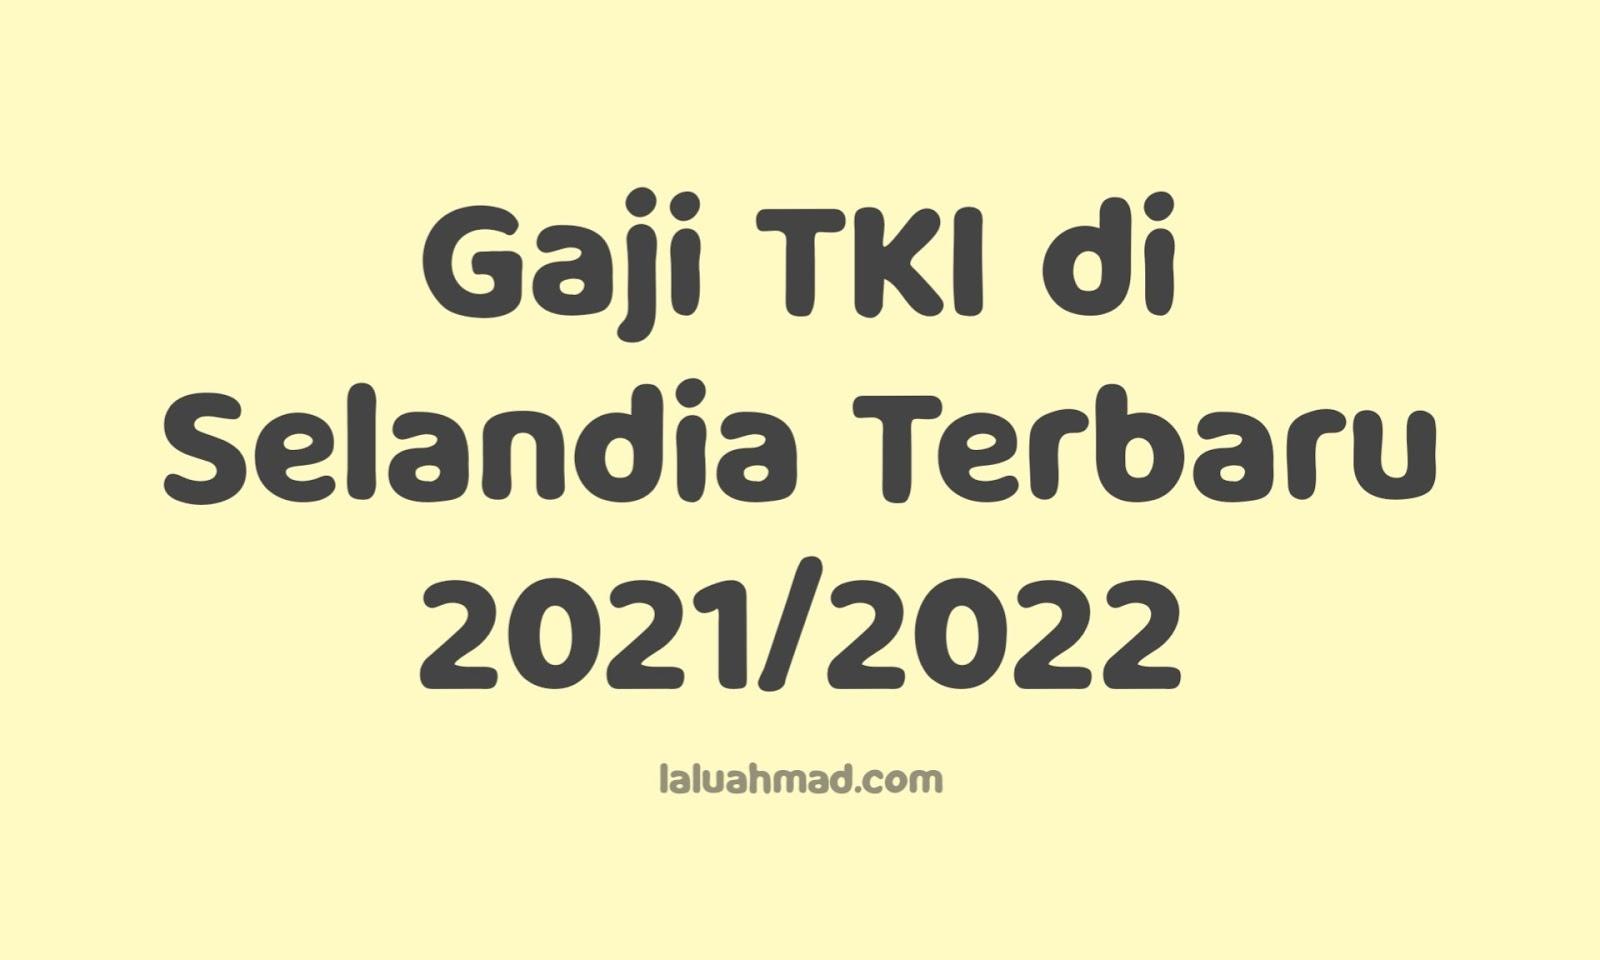 Gaji TKI di Selandia Terbaru 2021/2022